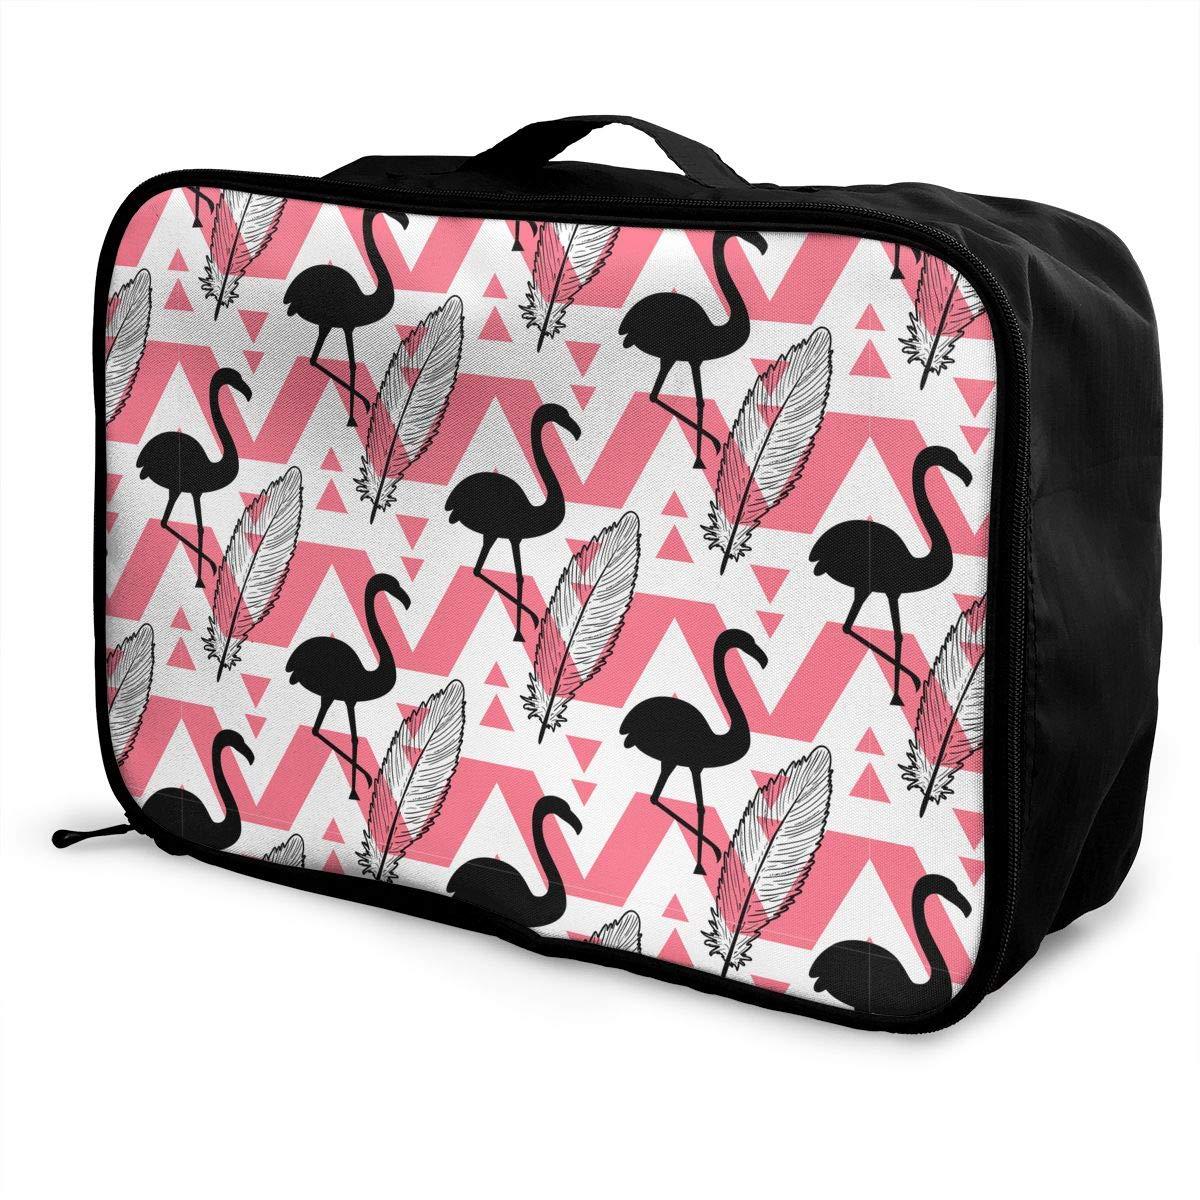 Rhinestone Pineapple Pink Flamingo Travel Bag Best Luggage Bags Duffle Bag Large Capacity Travel Organizer Bag